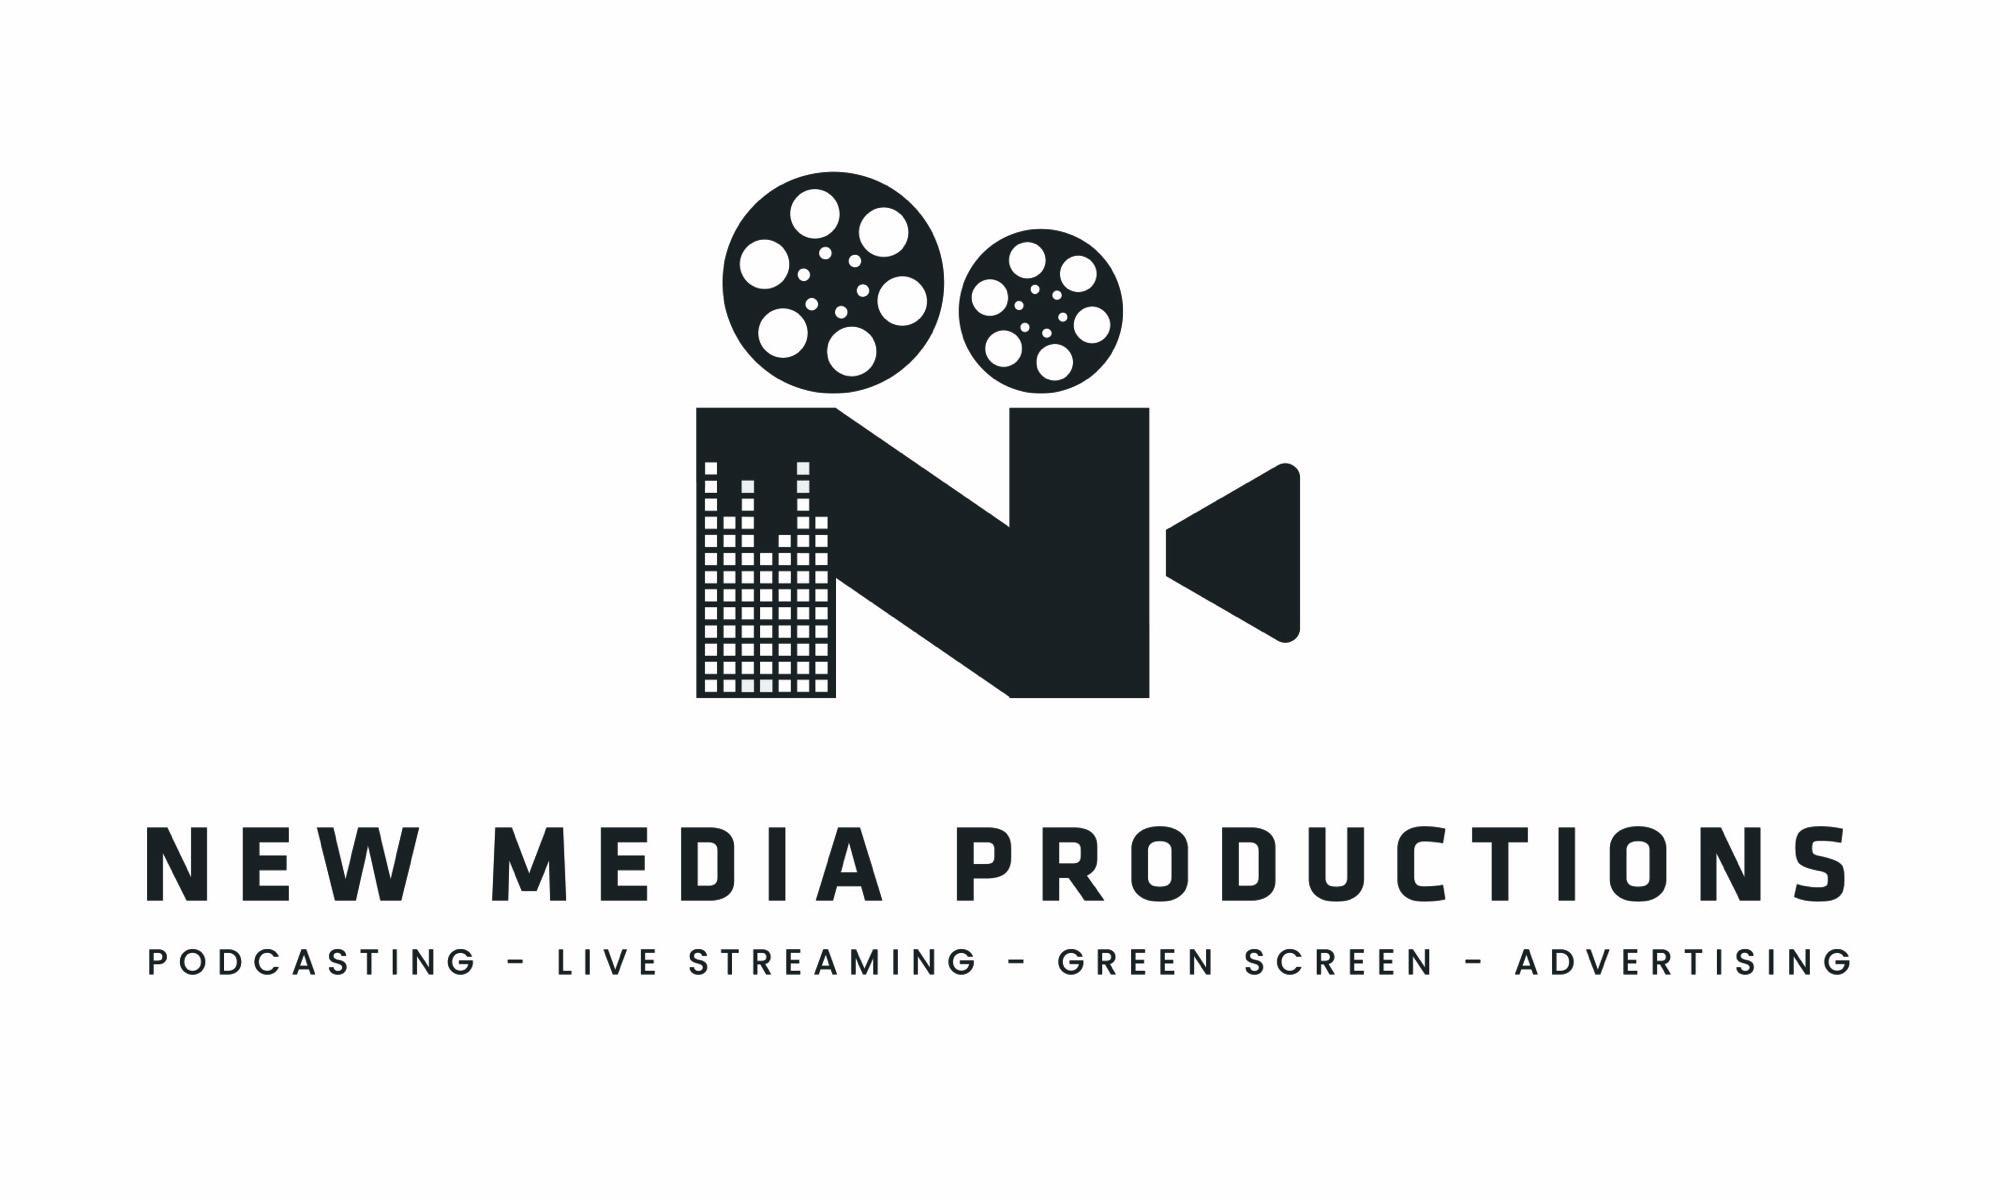 New Media Productions